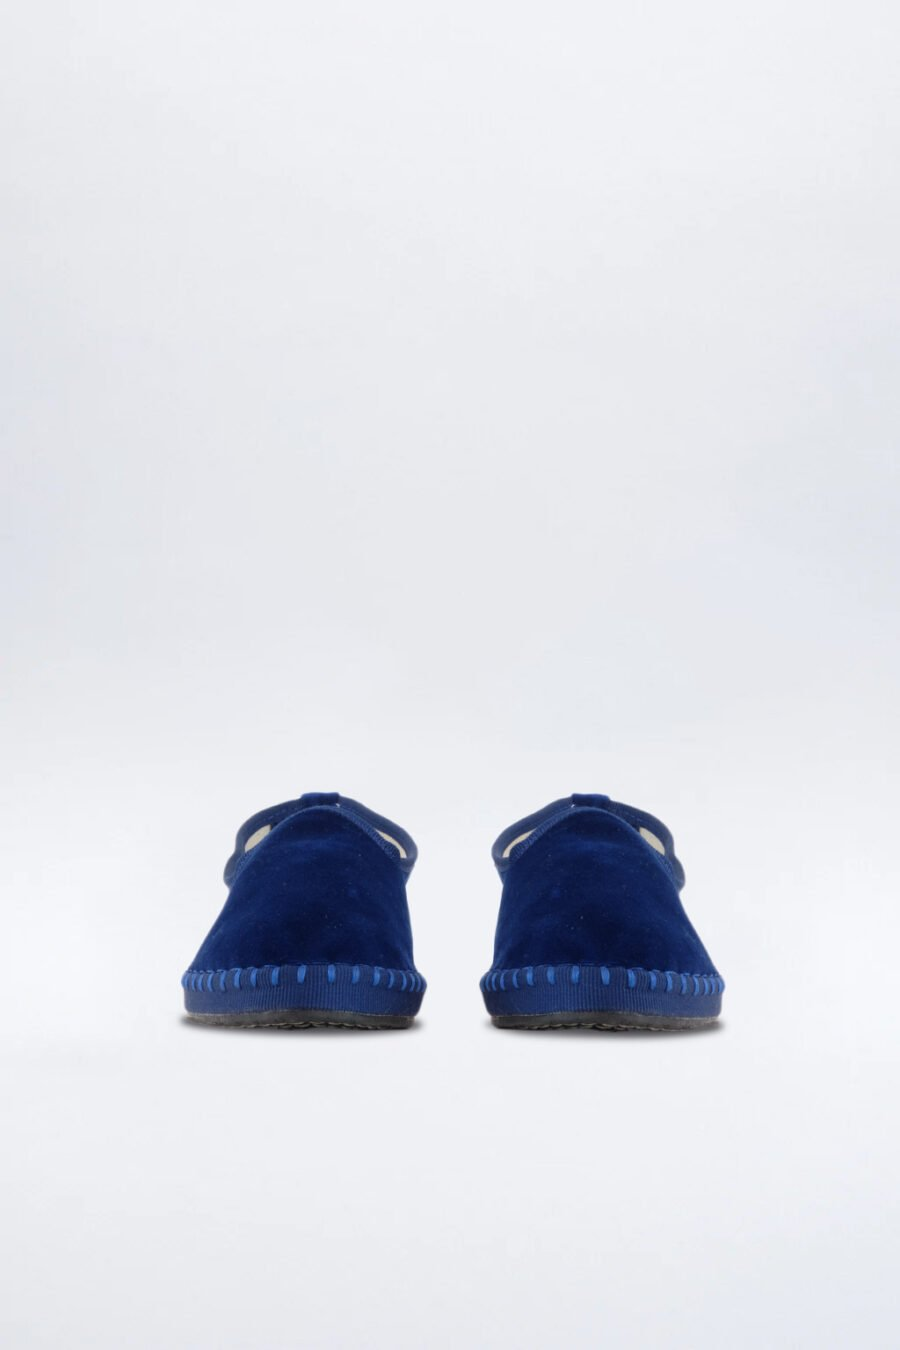 Co-Co Blue